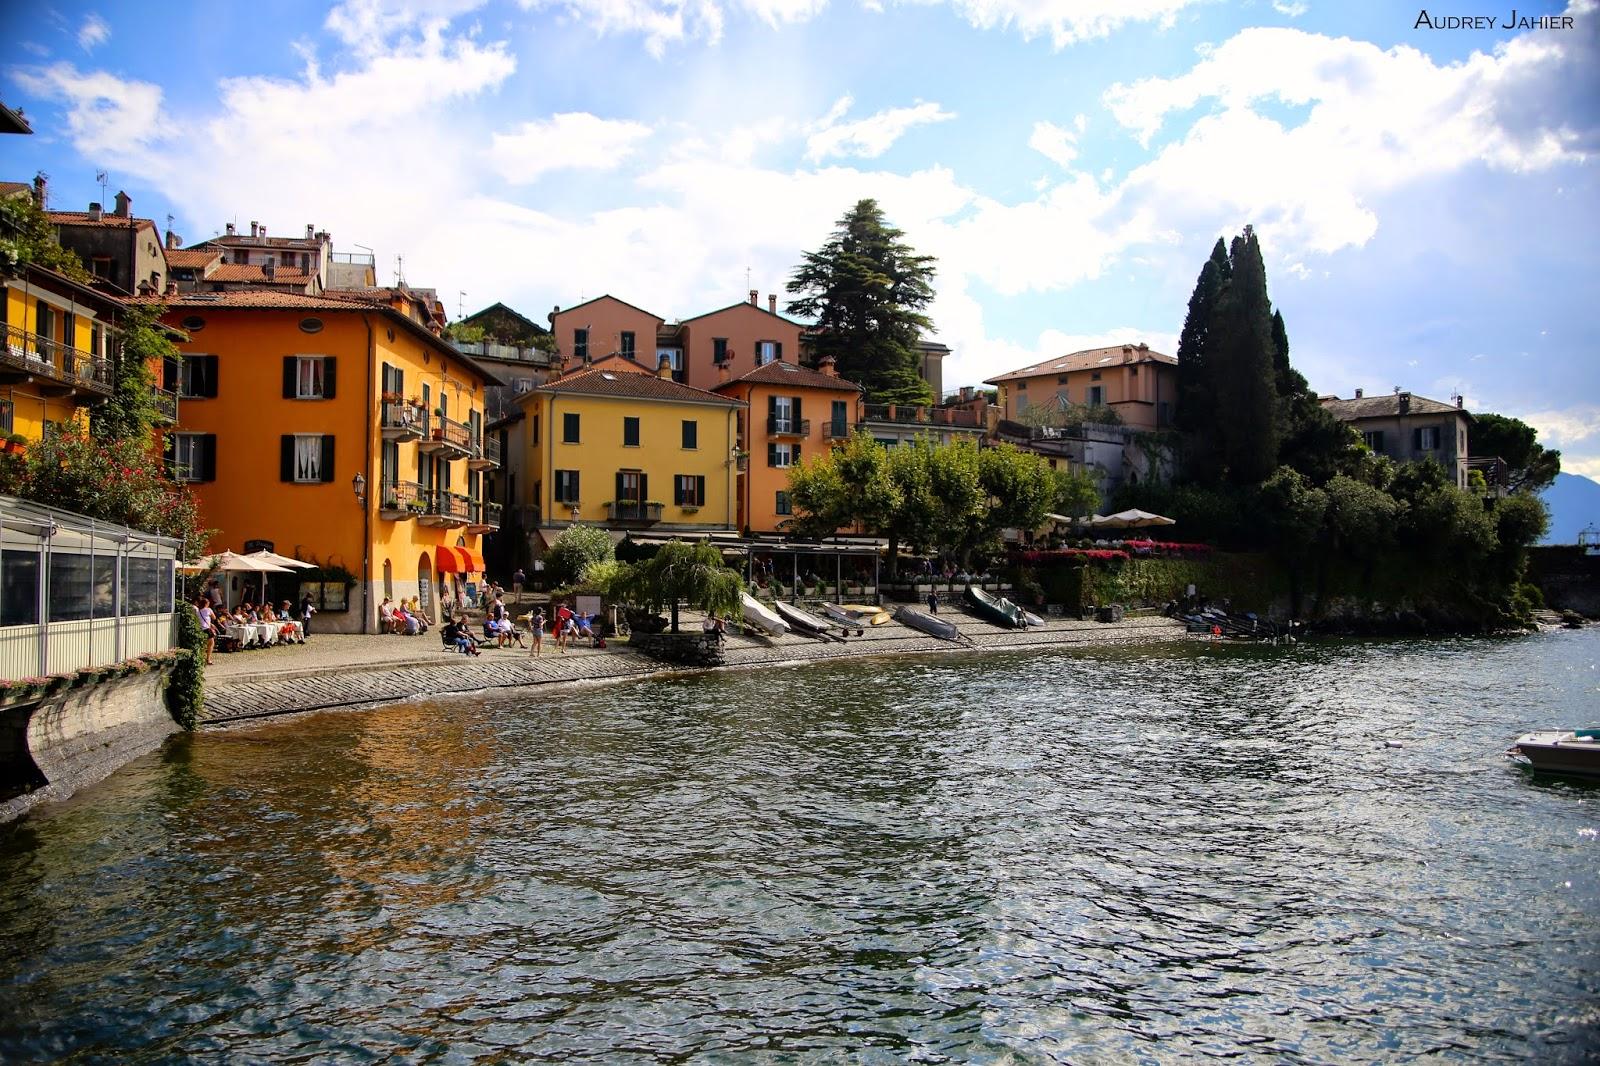 Varenna-villa-monastero-lac-de-come